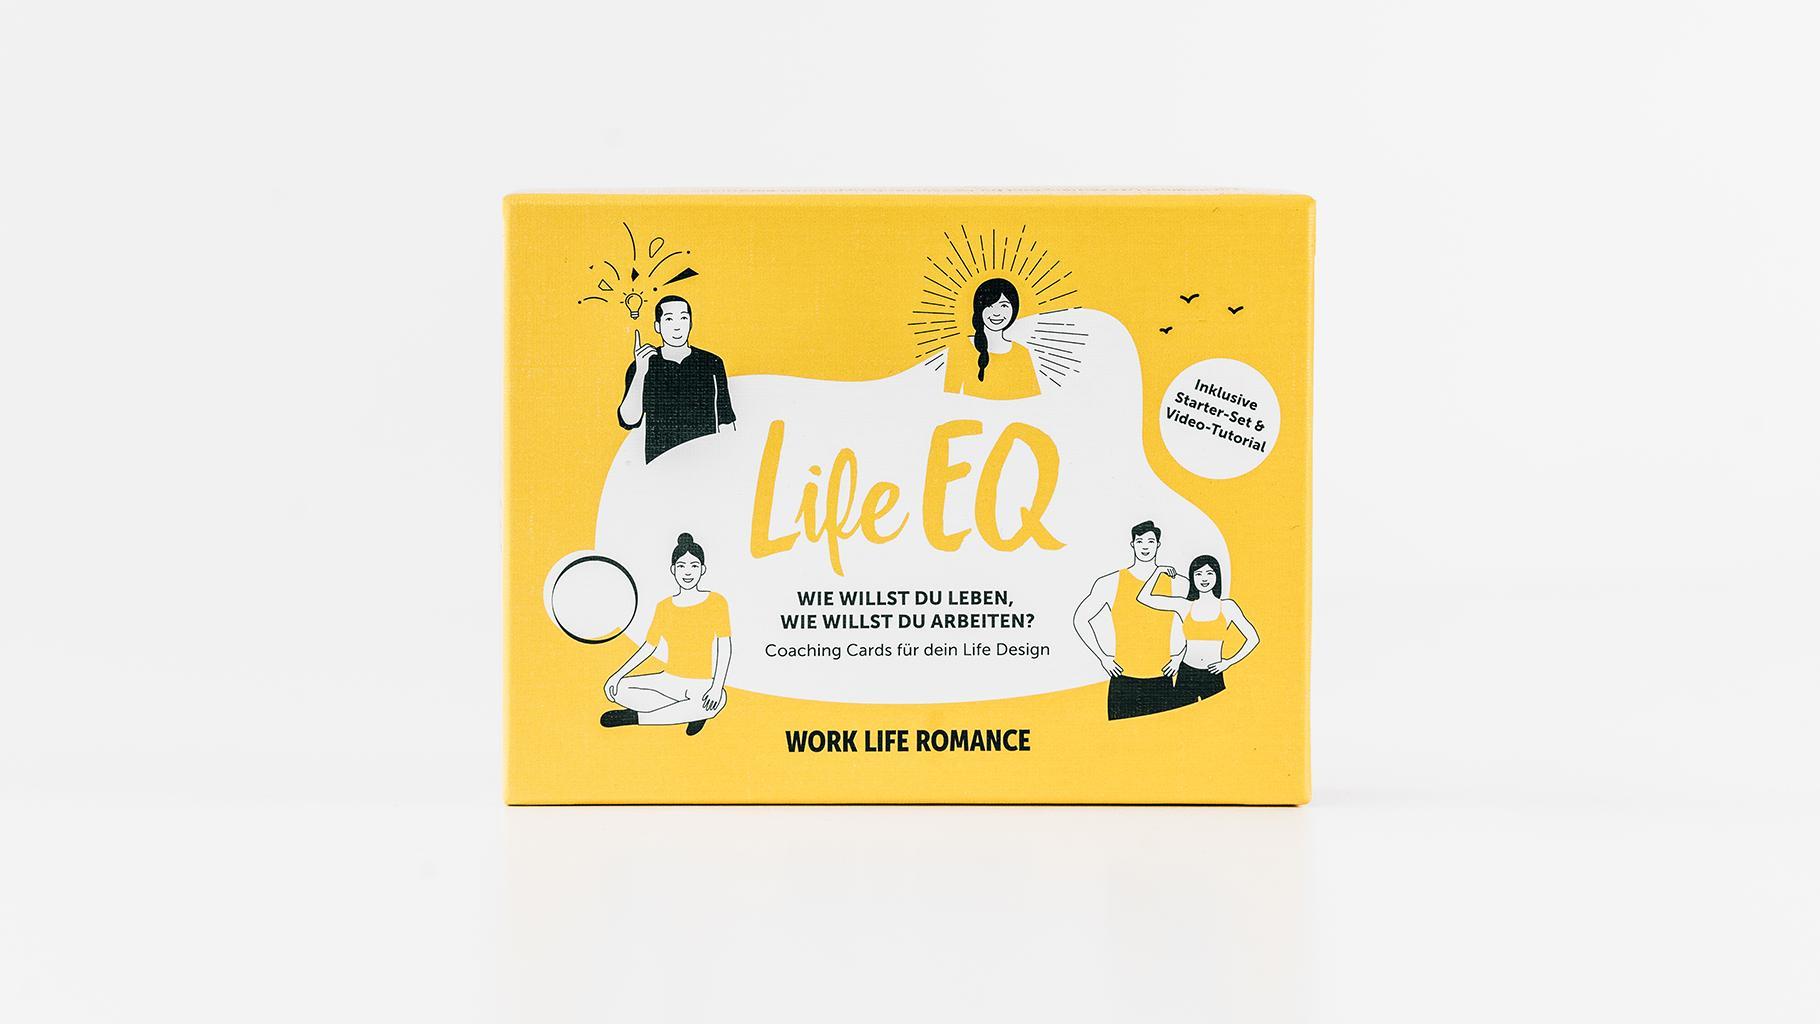 Life EQ - Work Life Romance Coaching Cards - Joshua Hoffmann